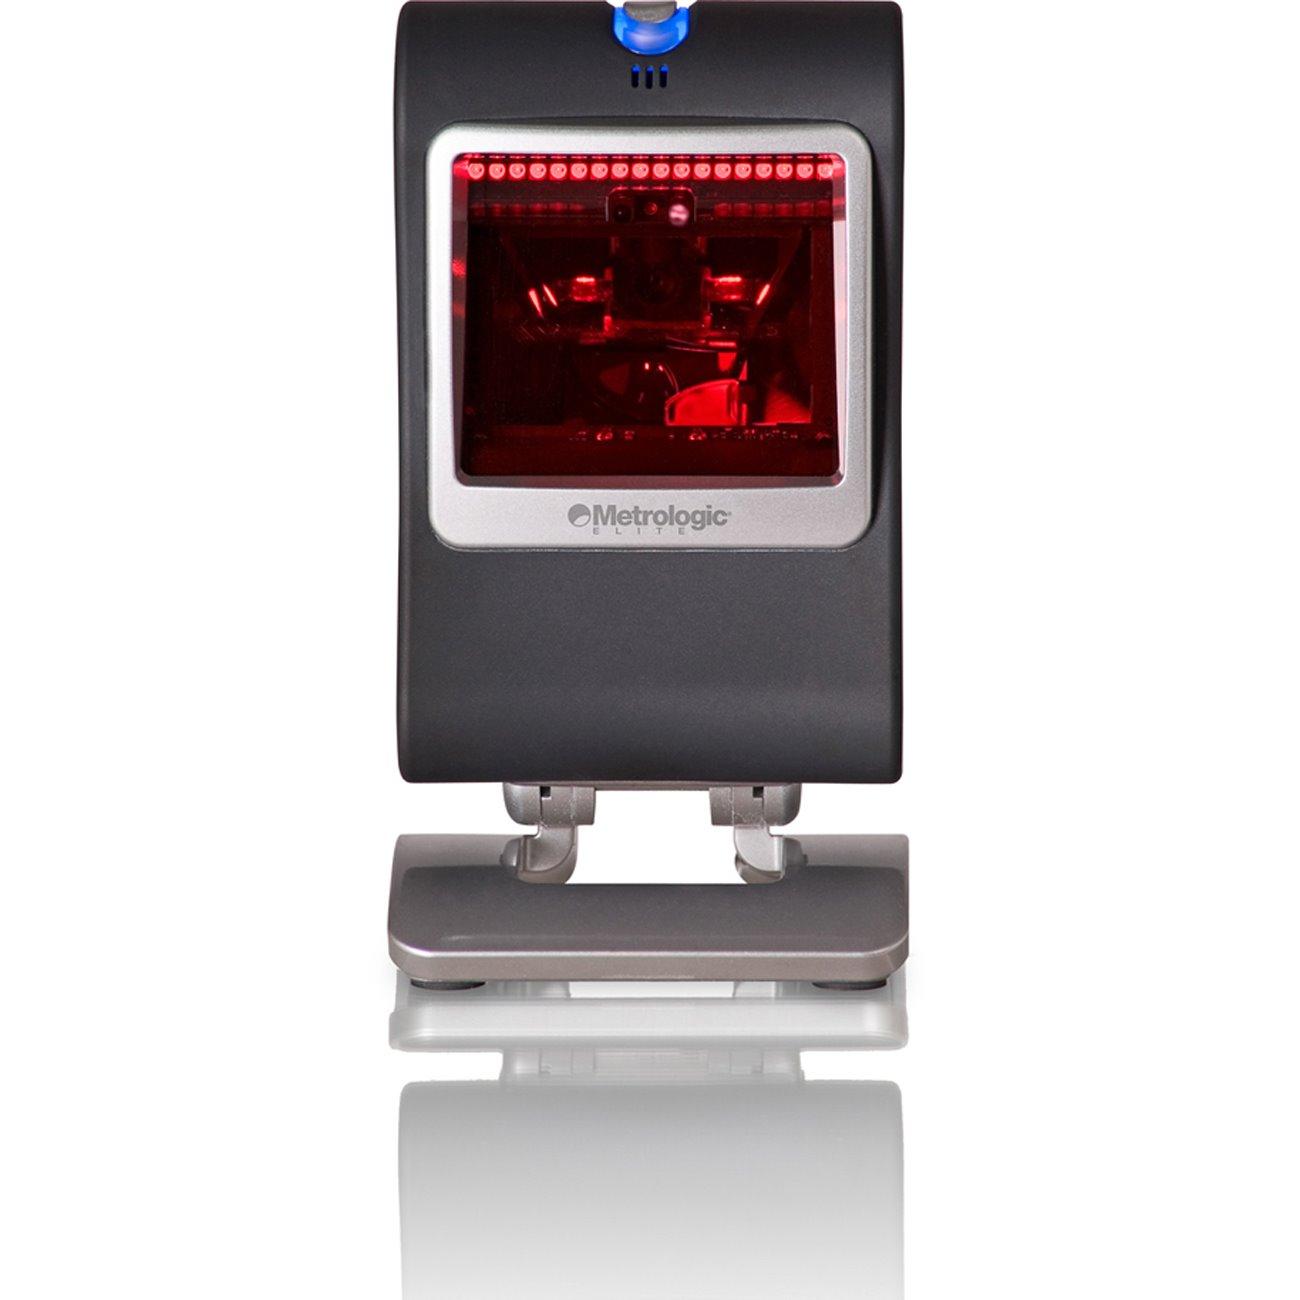 Honeywell Genesis MS7580 Desktop Barcode Scanner - Cable Connectivity - Dark Grey